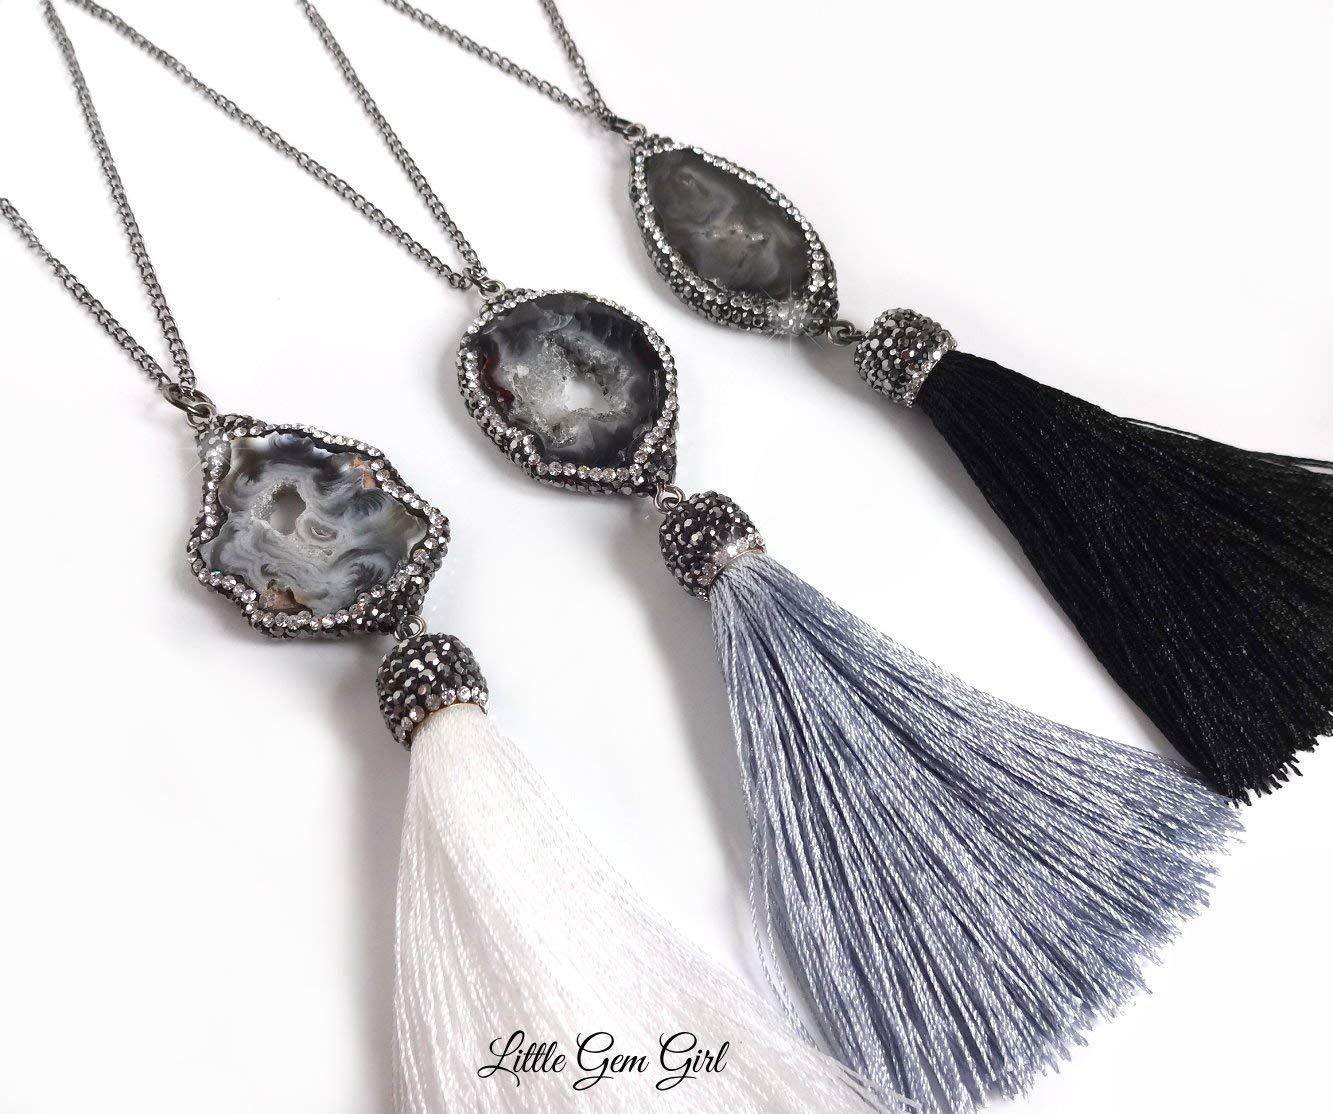 One Long Gunmetal Pave Zircon Black Agate Quartz Silk Tassel Necklace 30 Inch – Silky Tassel Pendant in White, Grey or Black